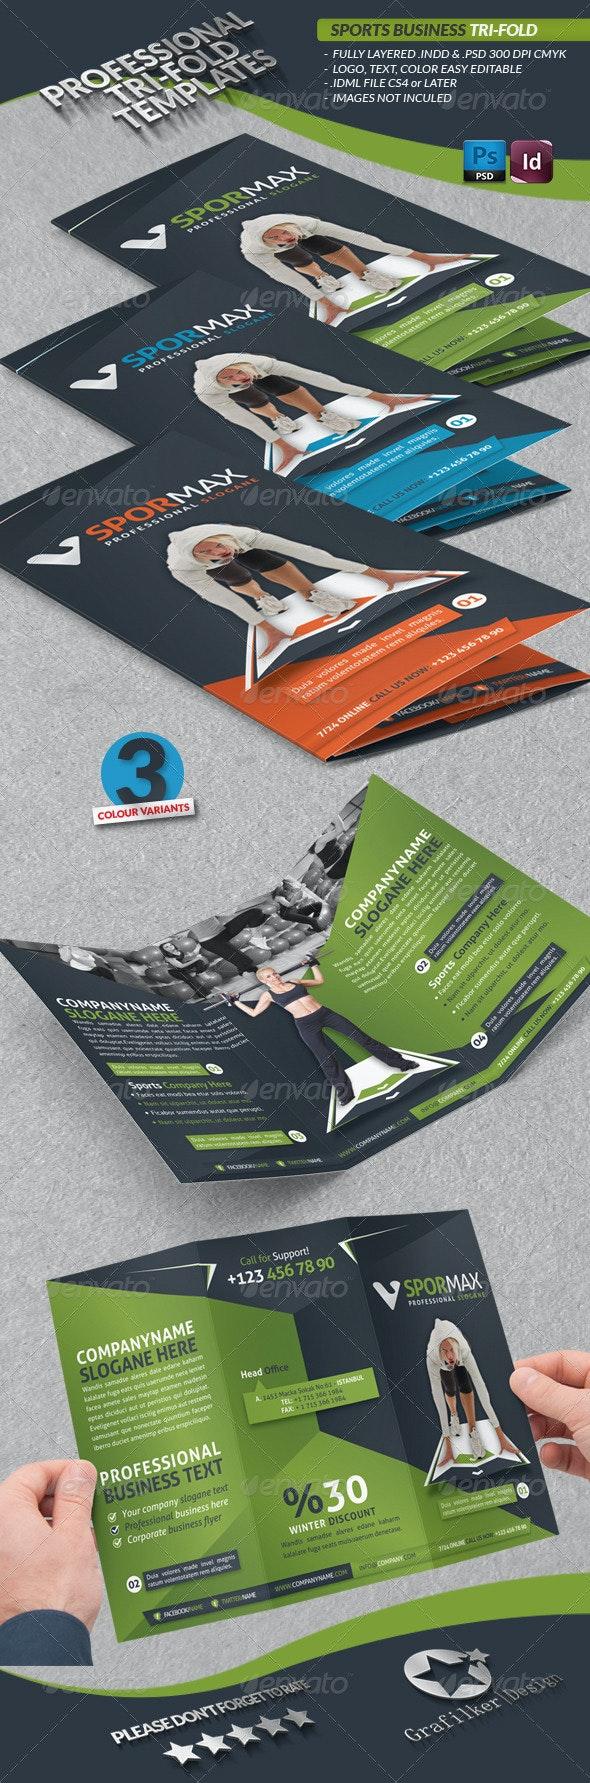 Sports Business Tri-fold - Brochures Print Templates